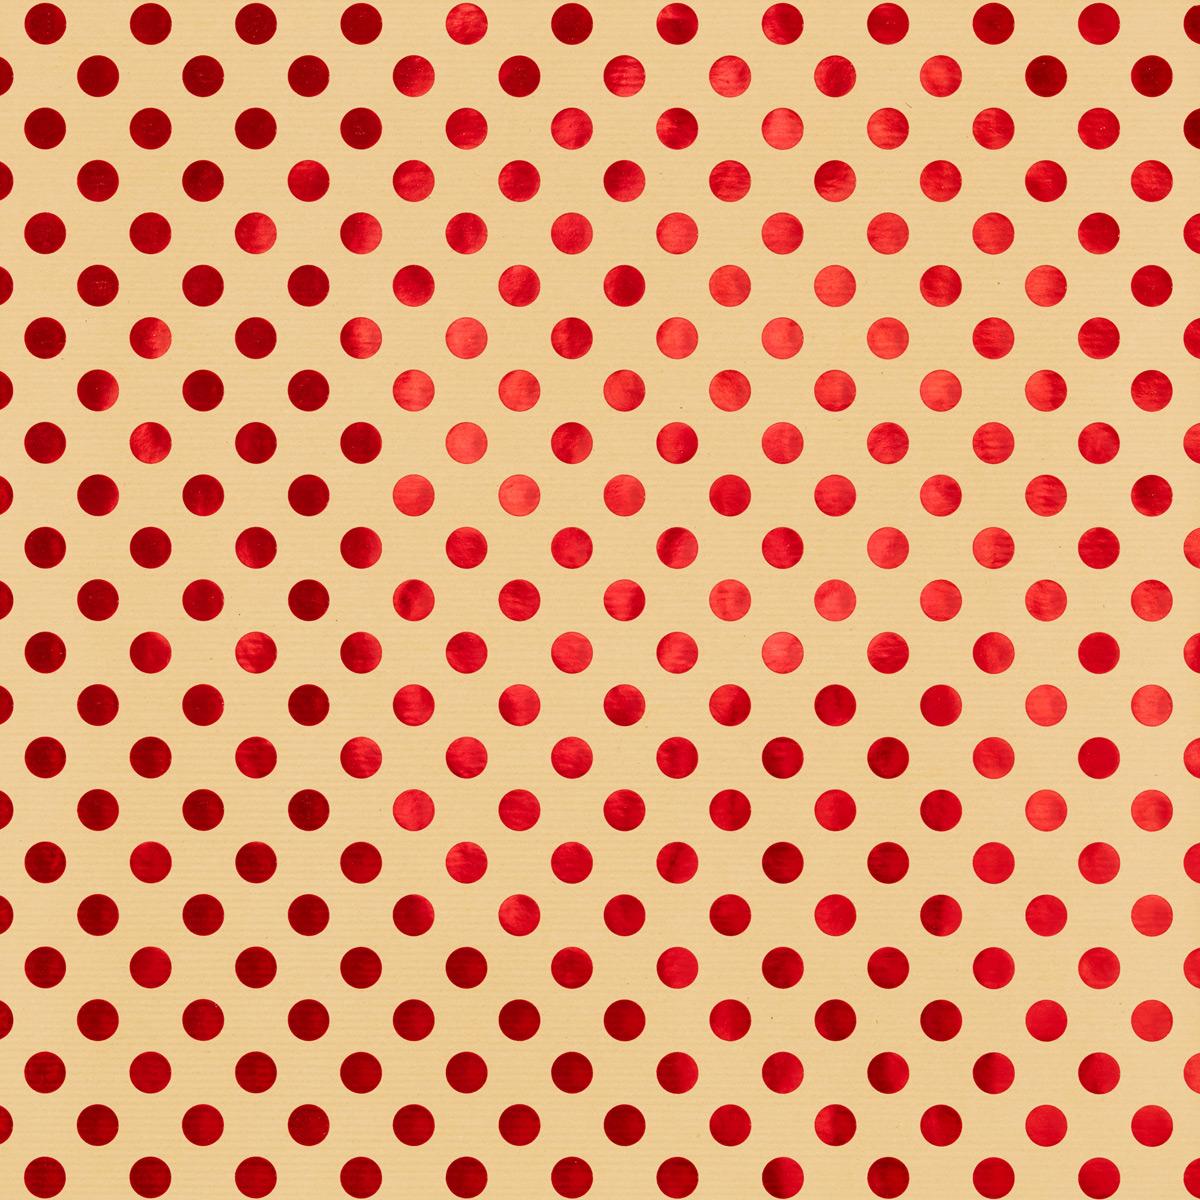 Wrap Foil Dots Red on Kraft